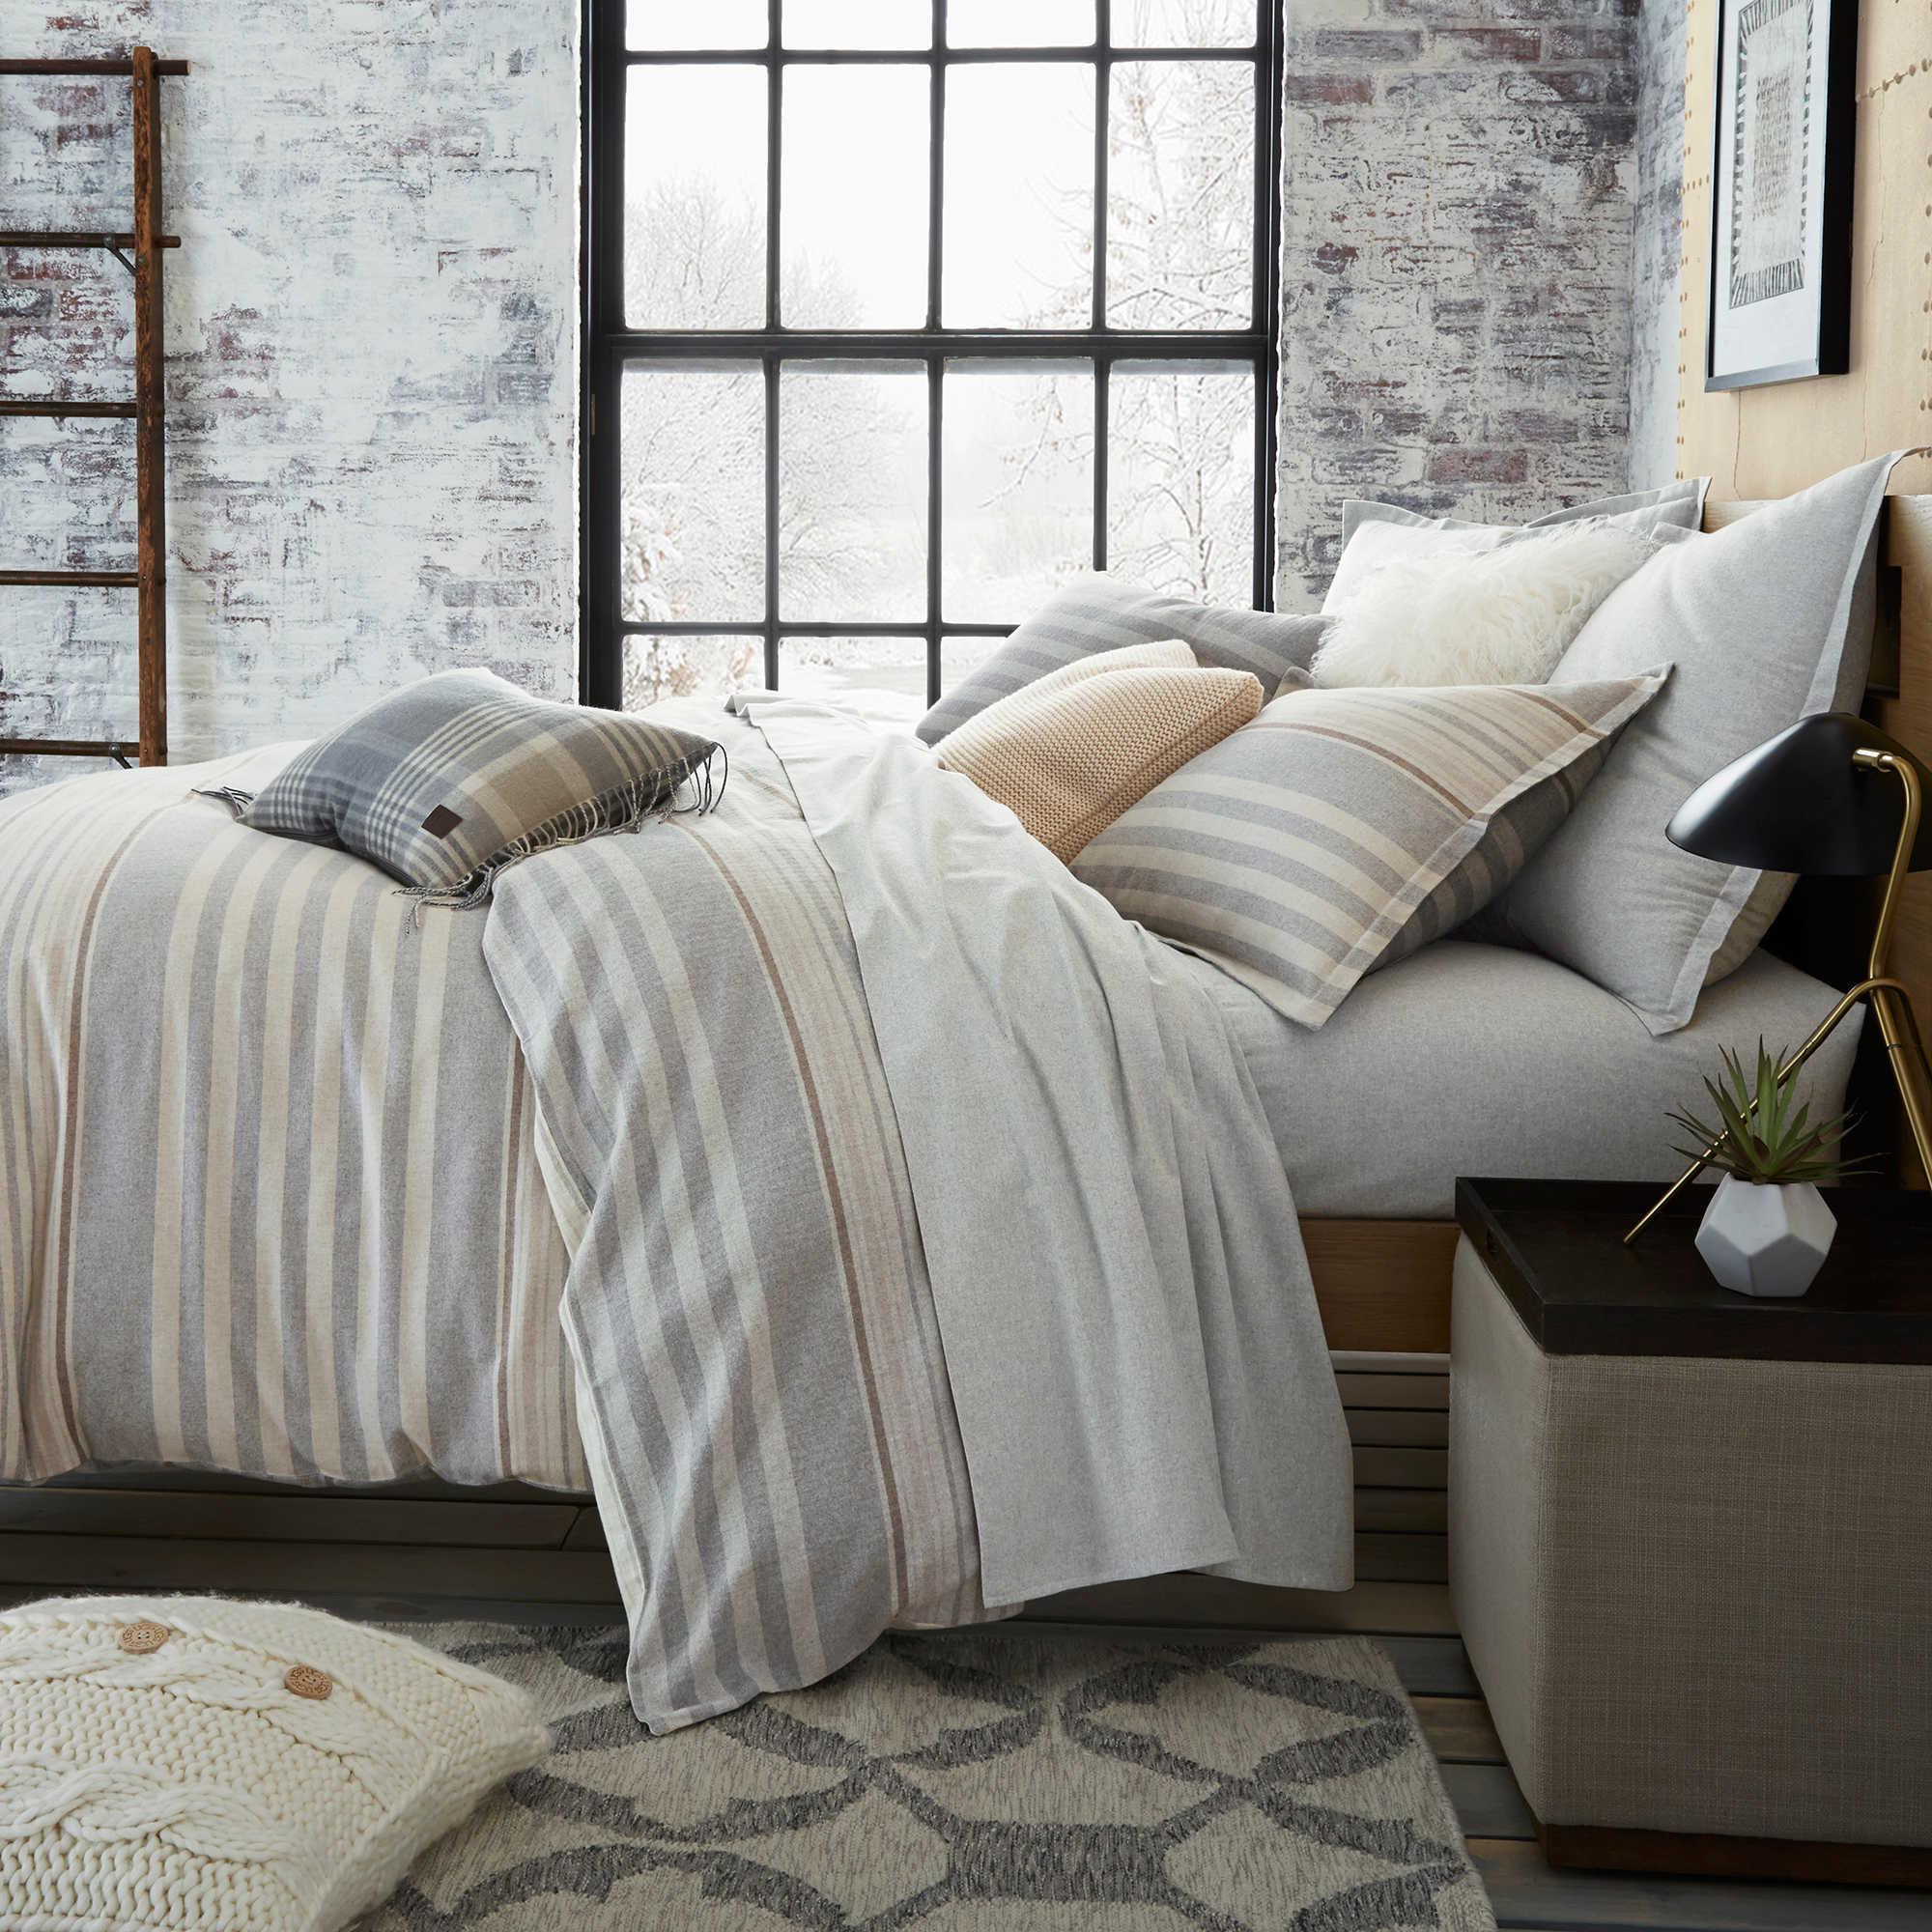 sham super pillow cover size comforter pcs itm king shams set soft comfortable duvet bedding for